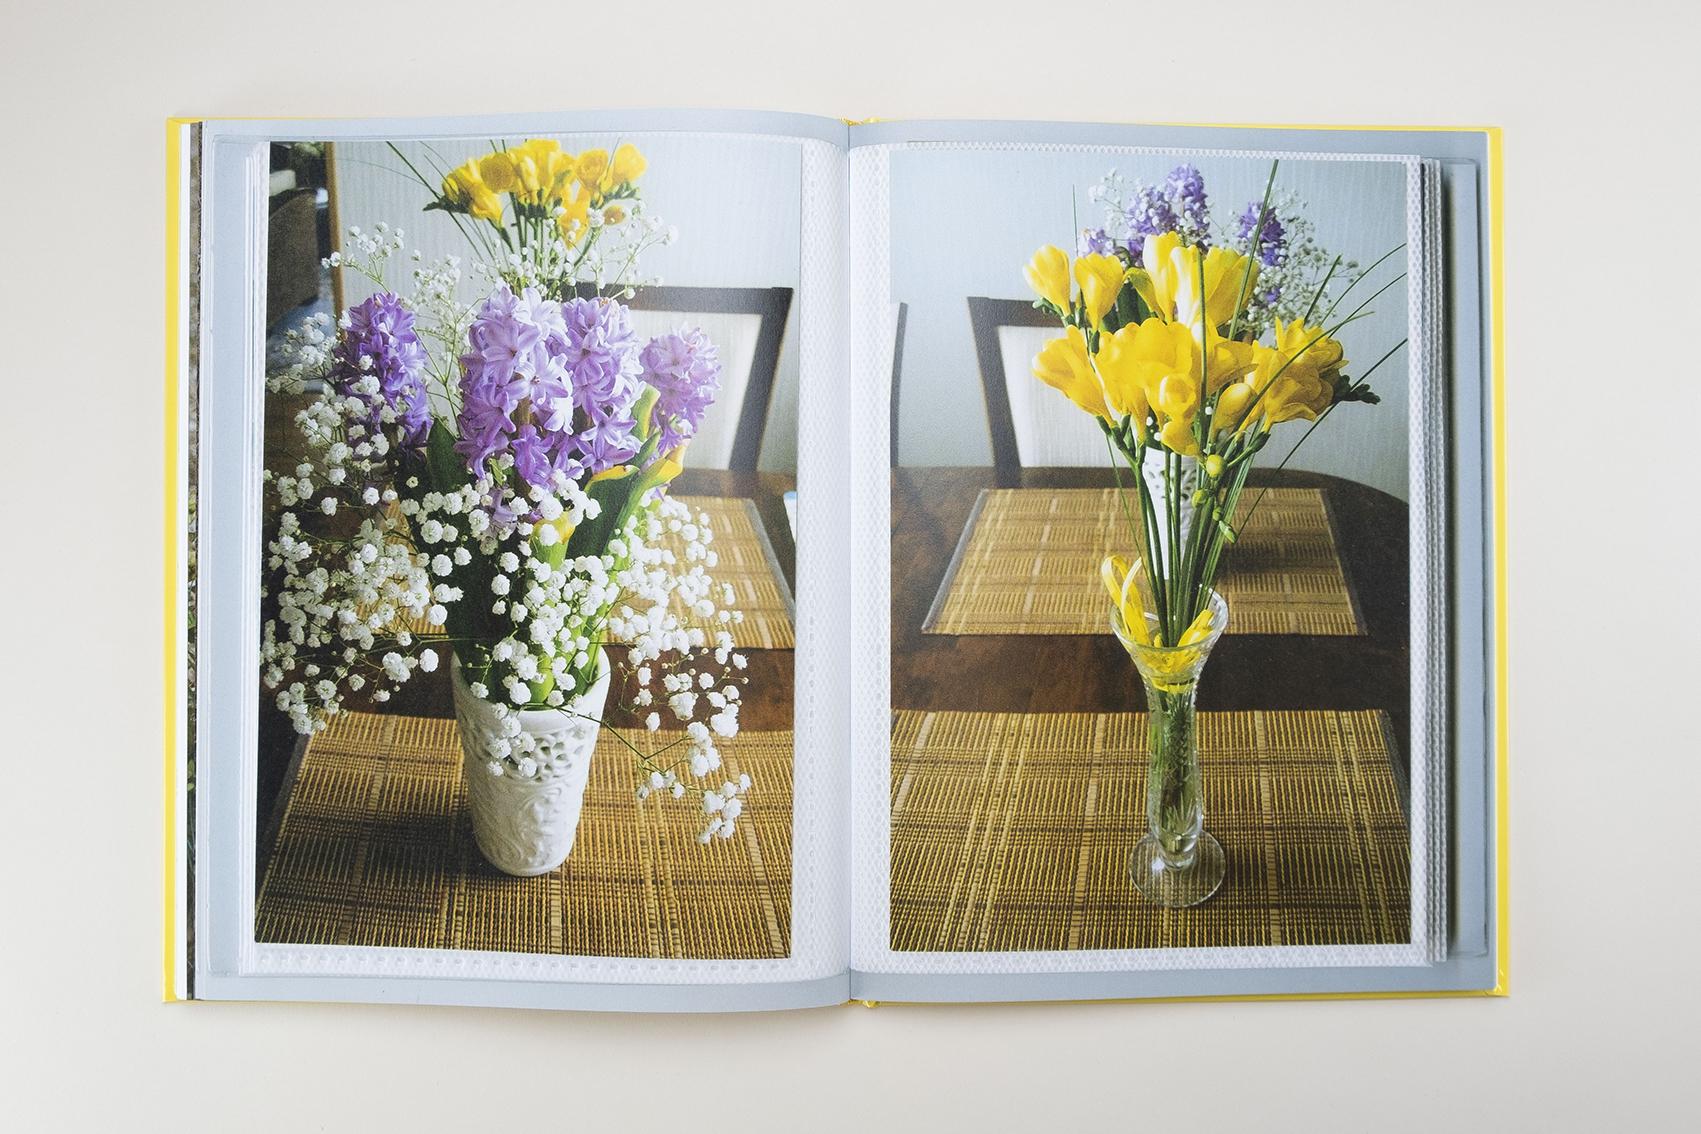 Diana Tamane: Flower Smuggler